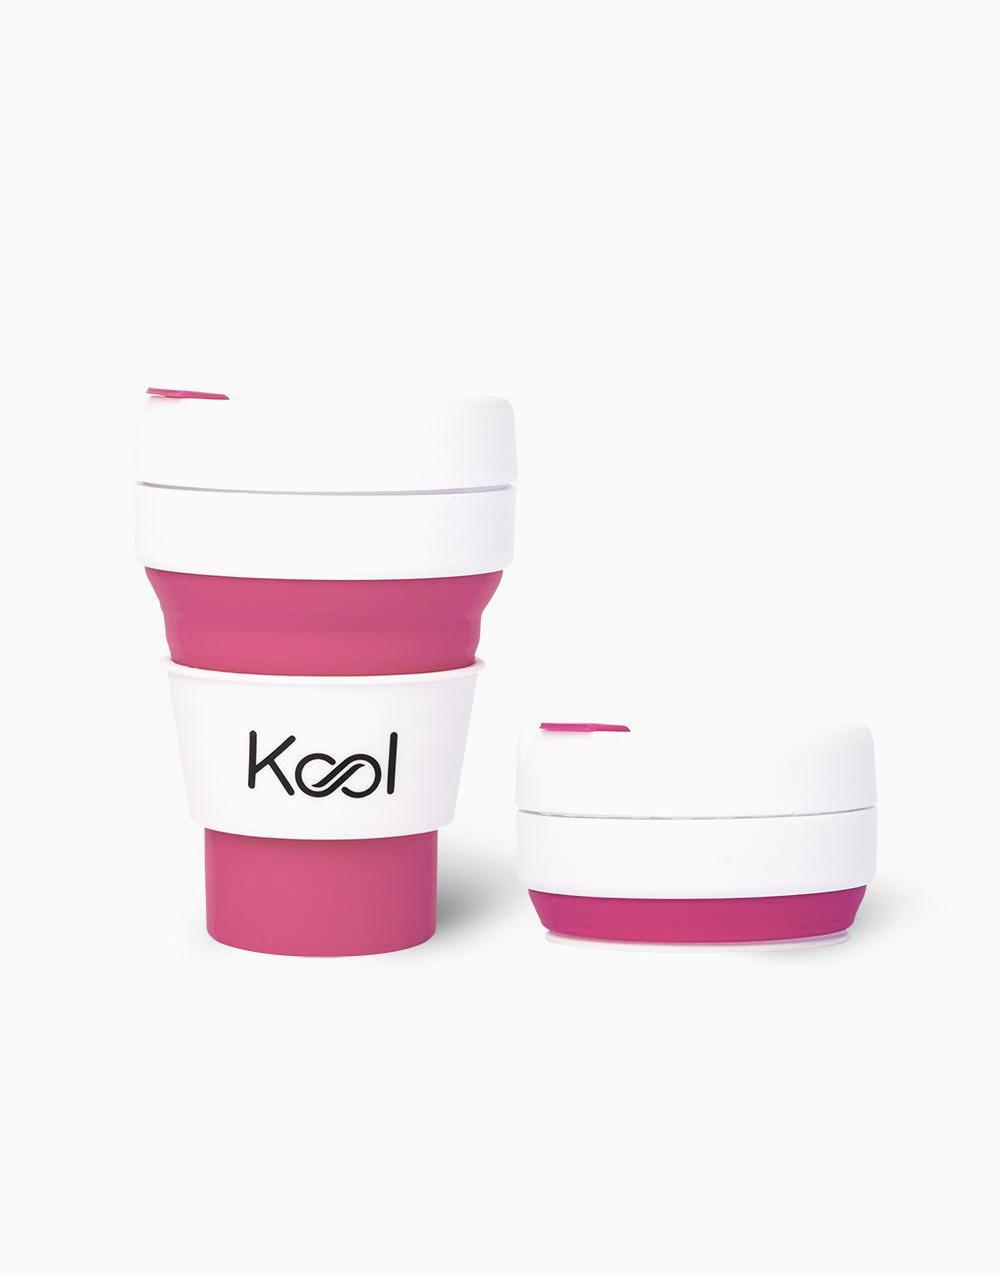 Kool Foldable Cup (355ml) by Kool   Flamingo